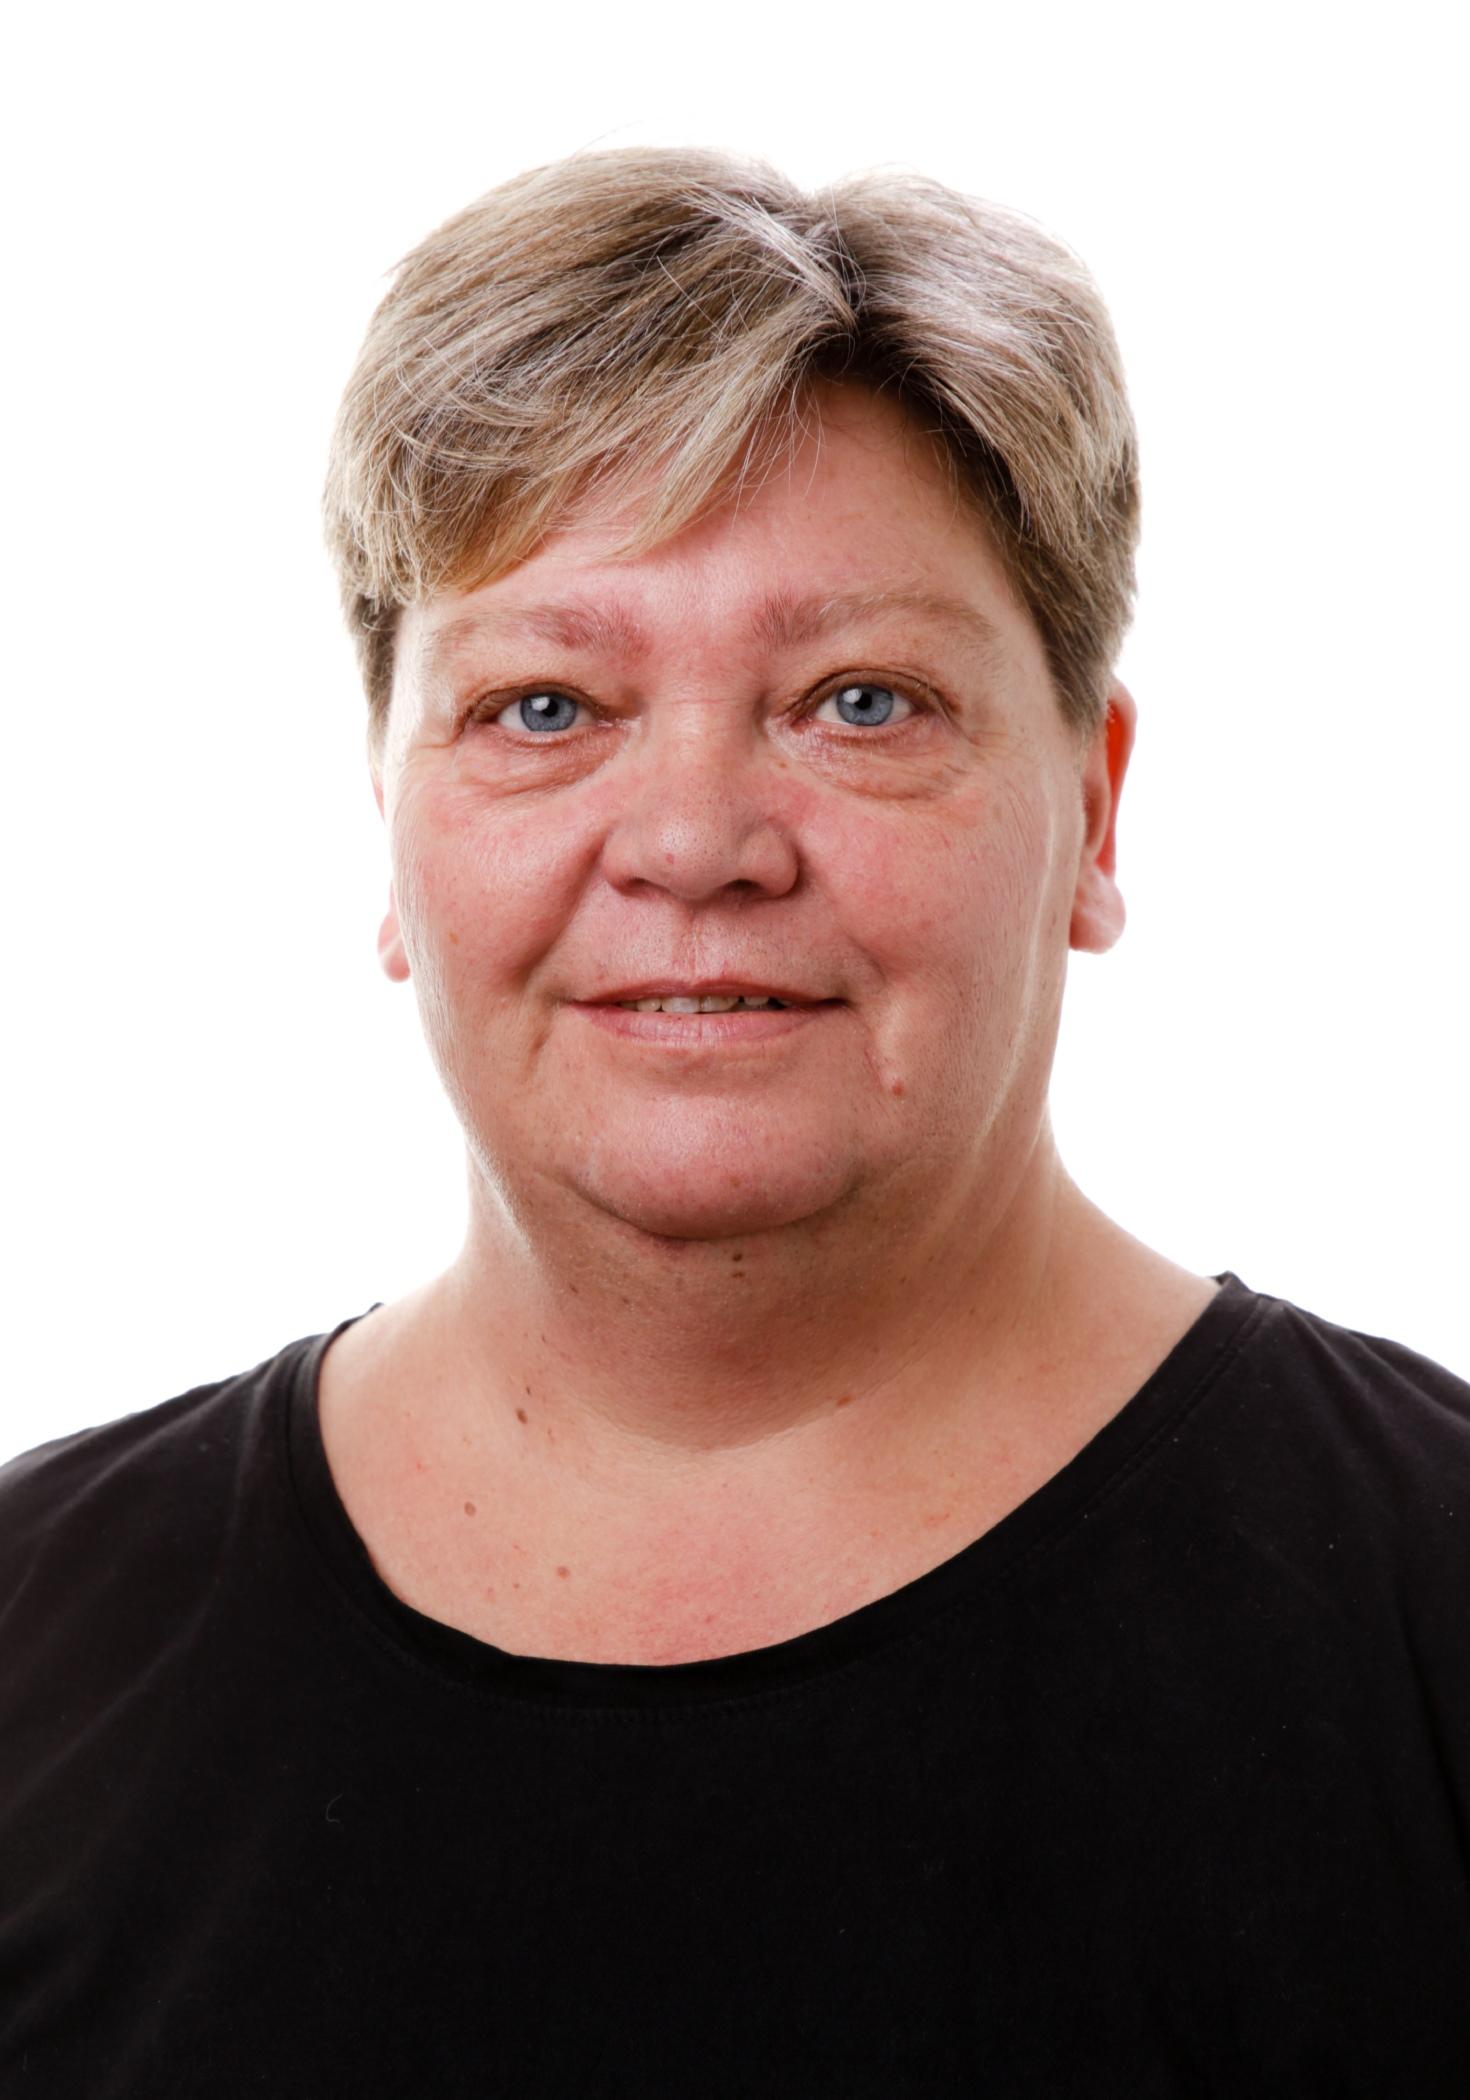 Pædagogmedhjælper, Gitte Hestbæk